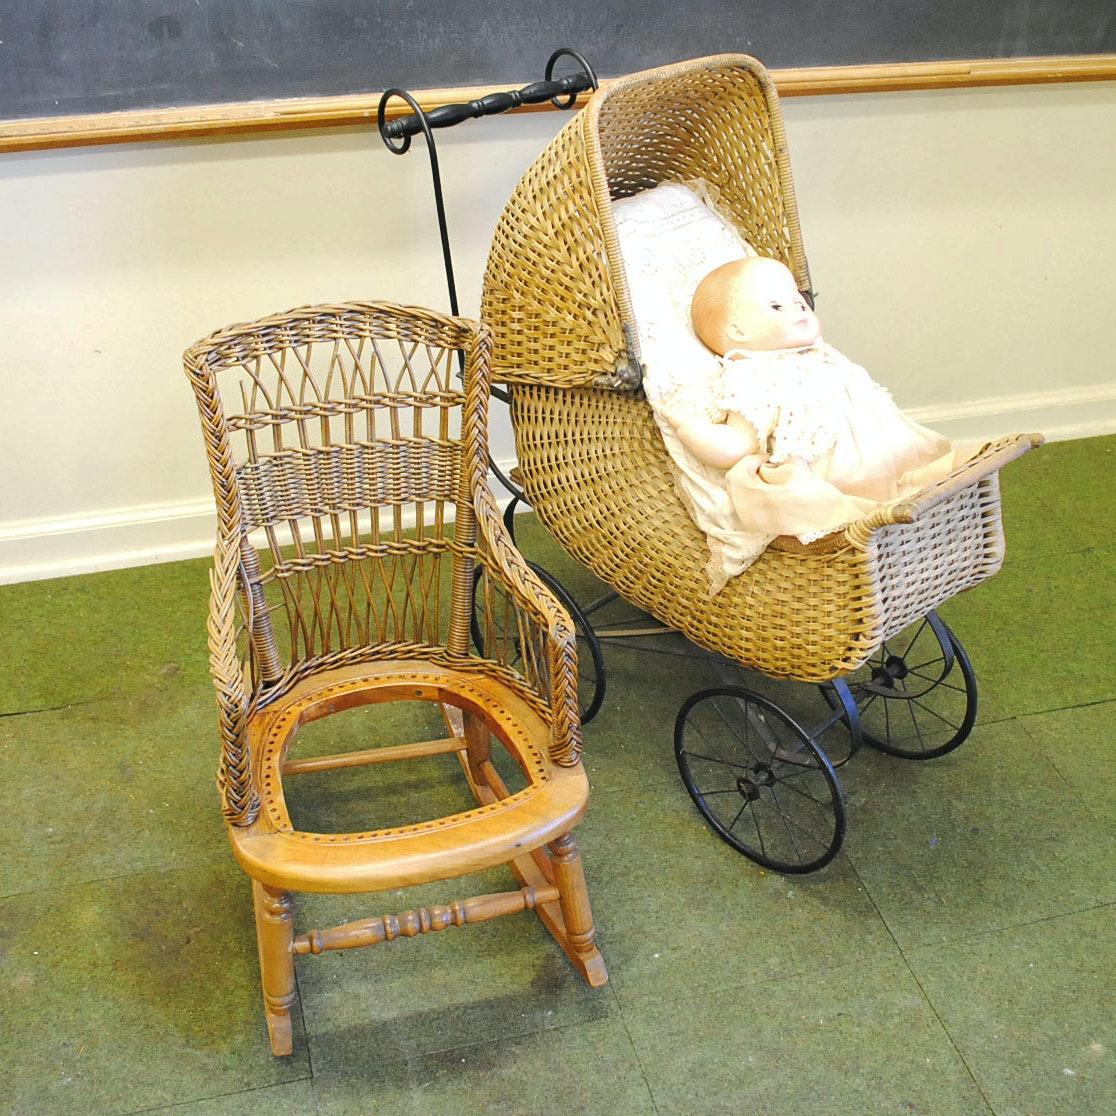 Vintage Child Size Wicker Rocking Chair and Wicker Pram